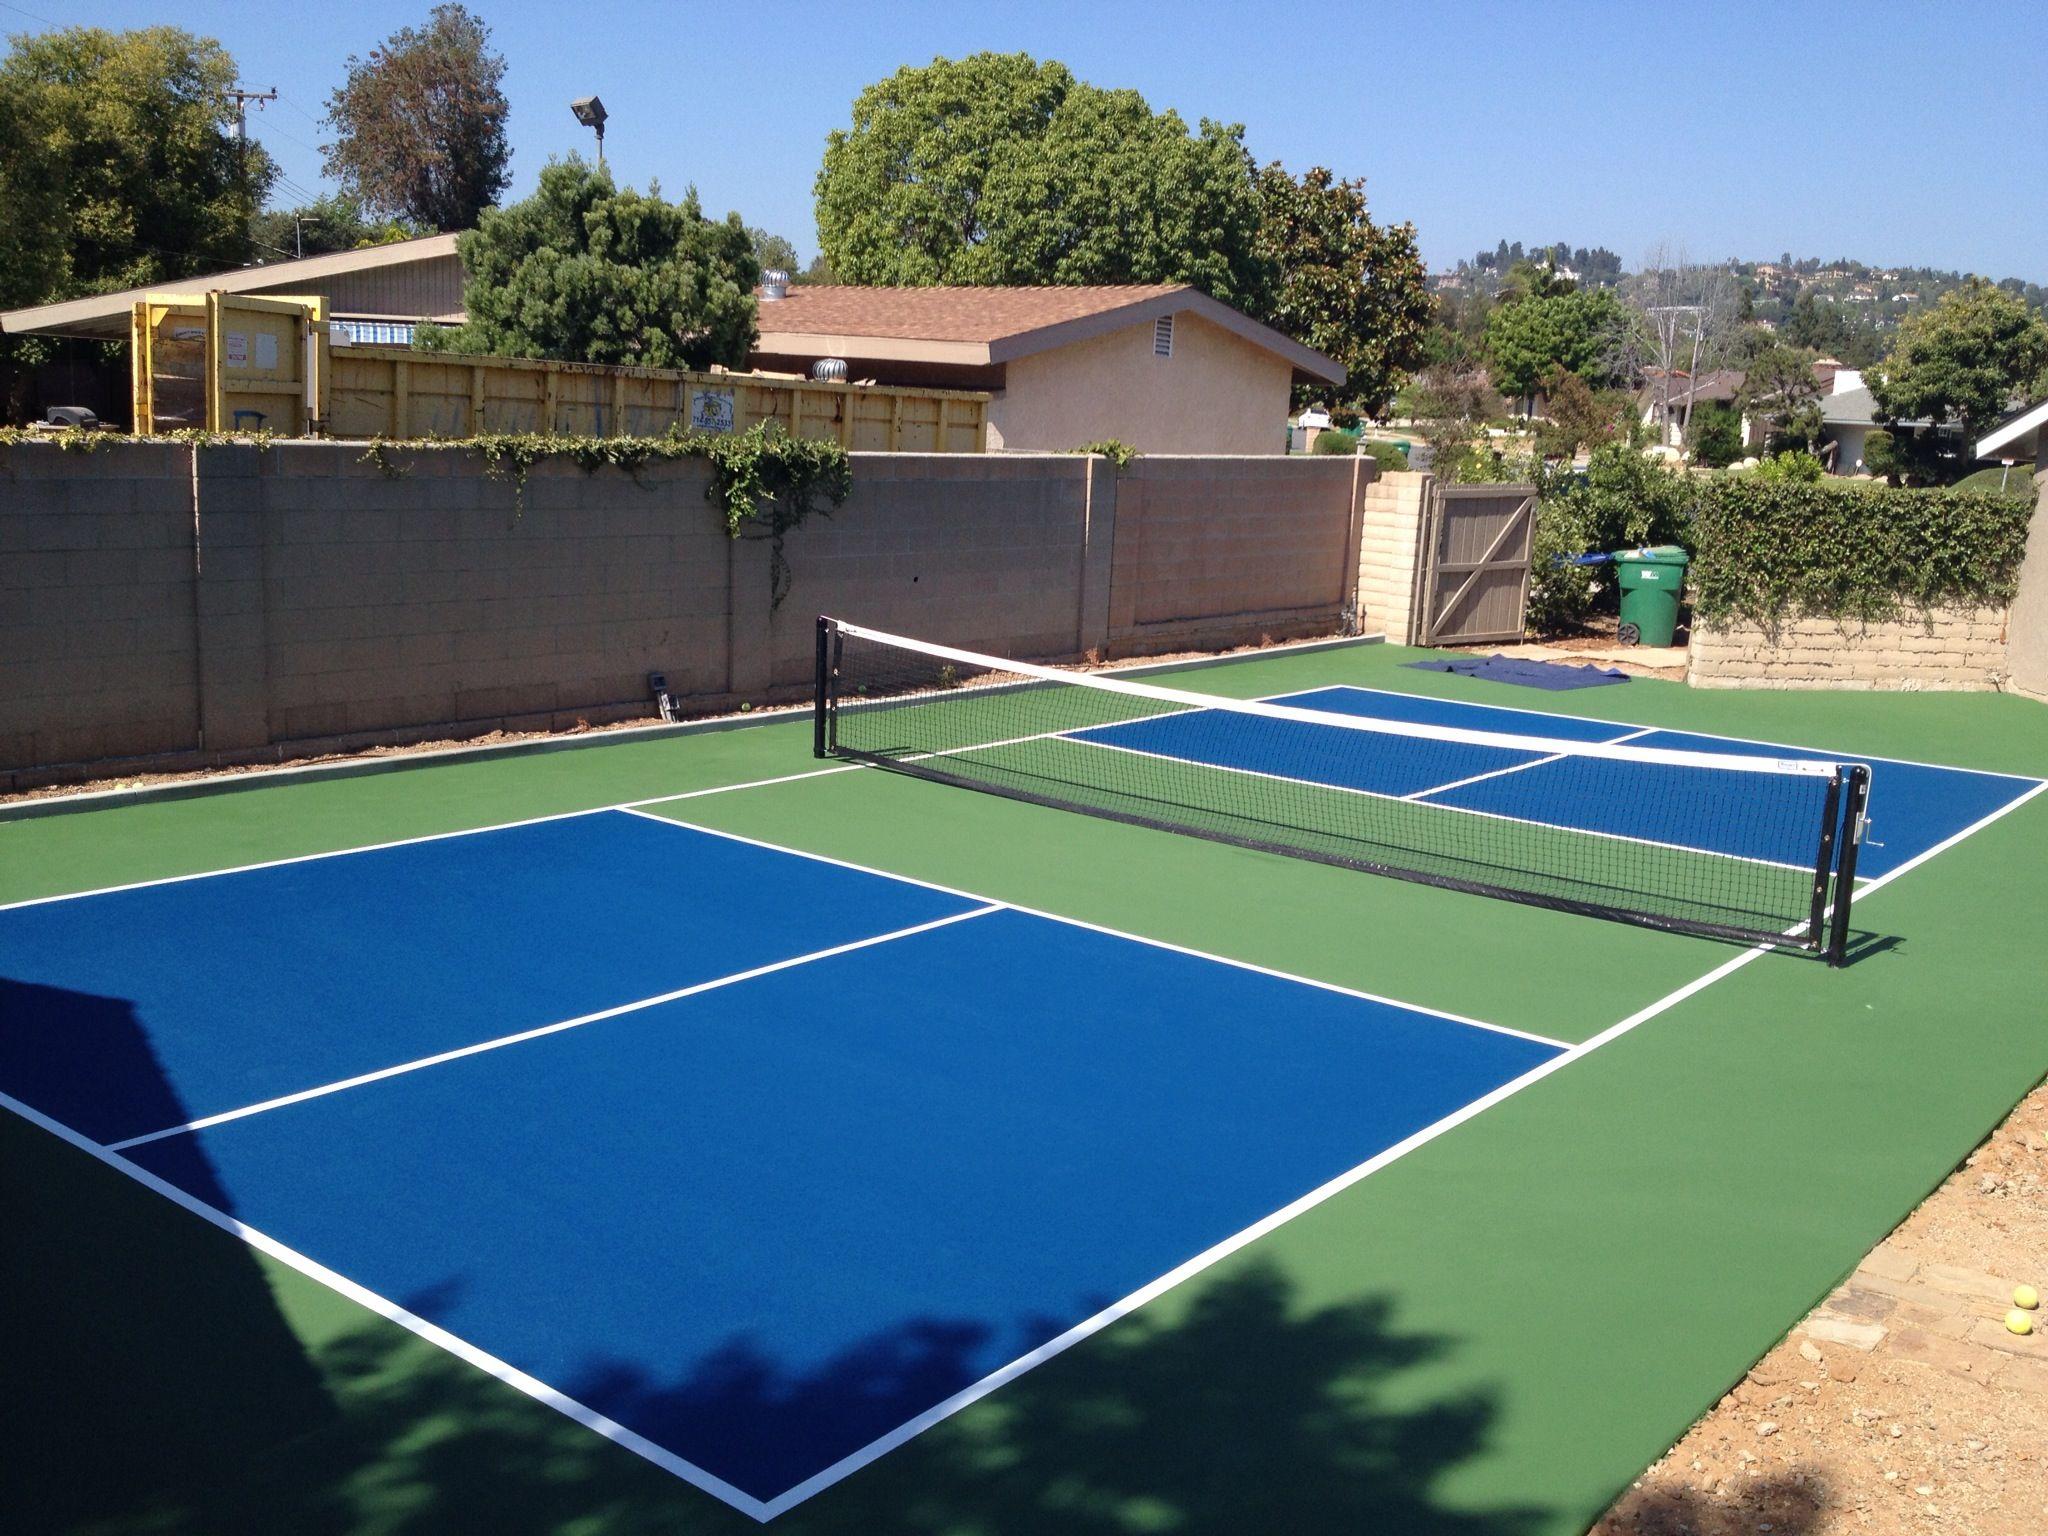 Private Backyard Pickleball Court Pickleball Court Tennis Court Pickleball Mini backyard tennis court